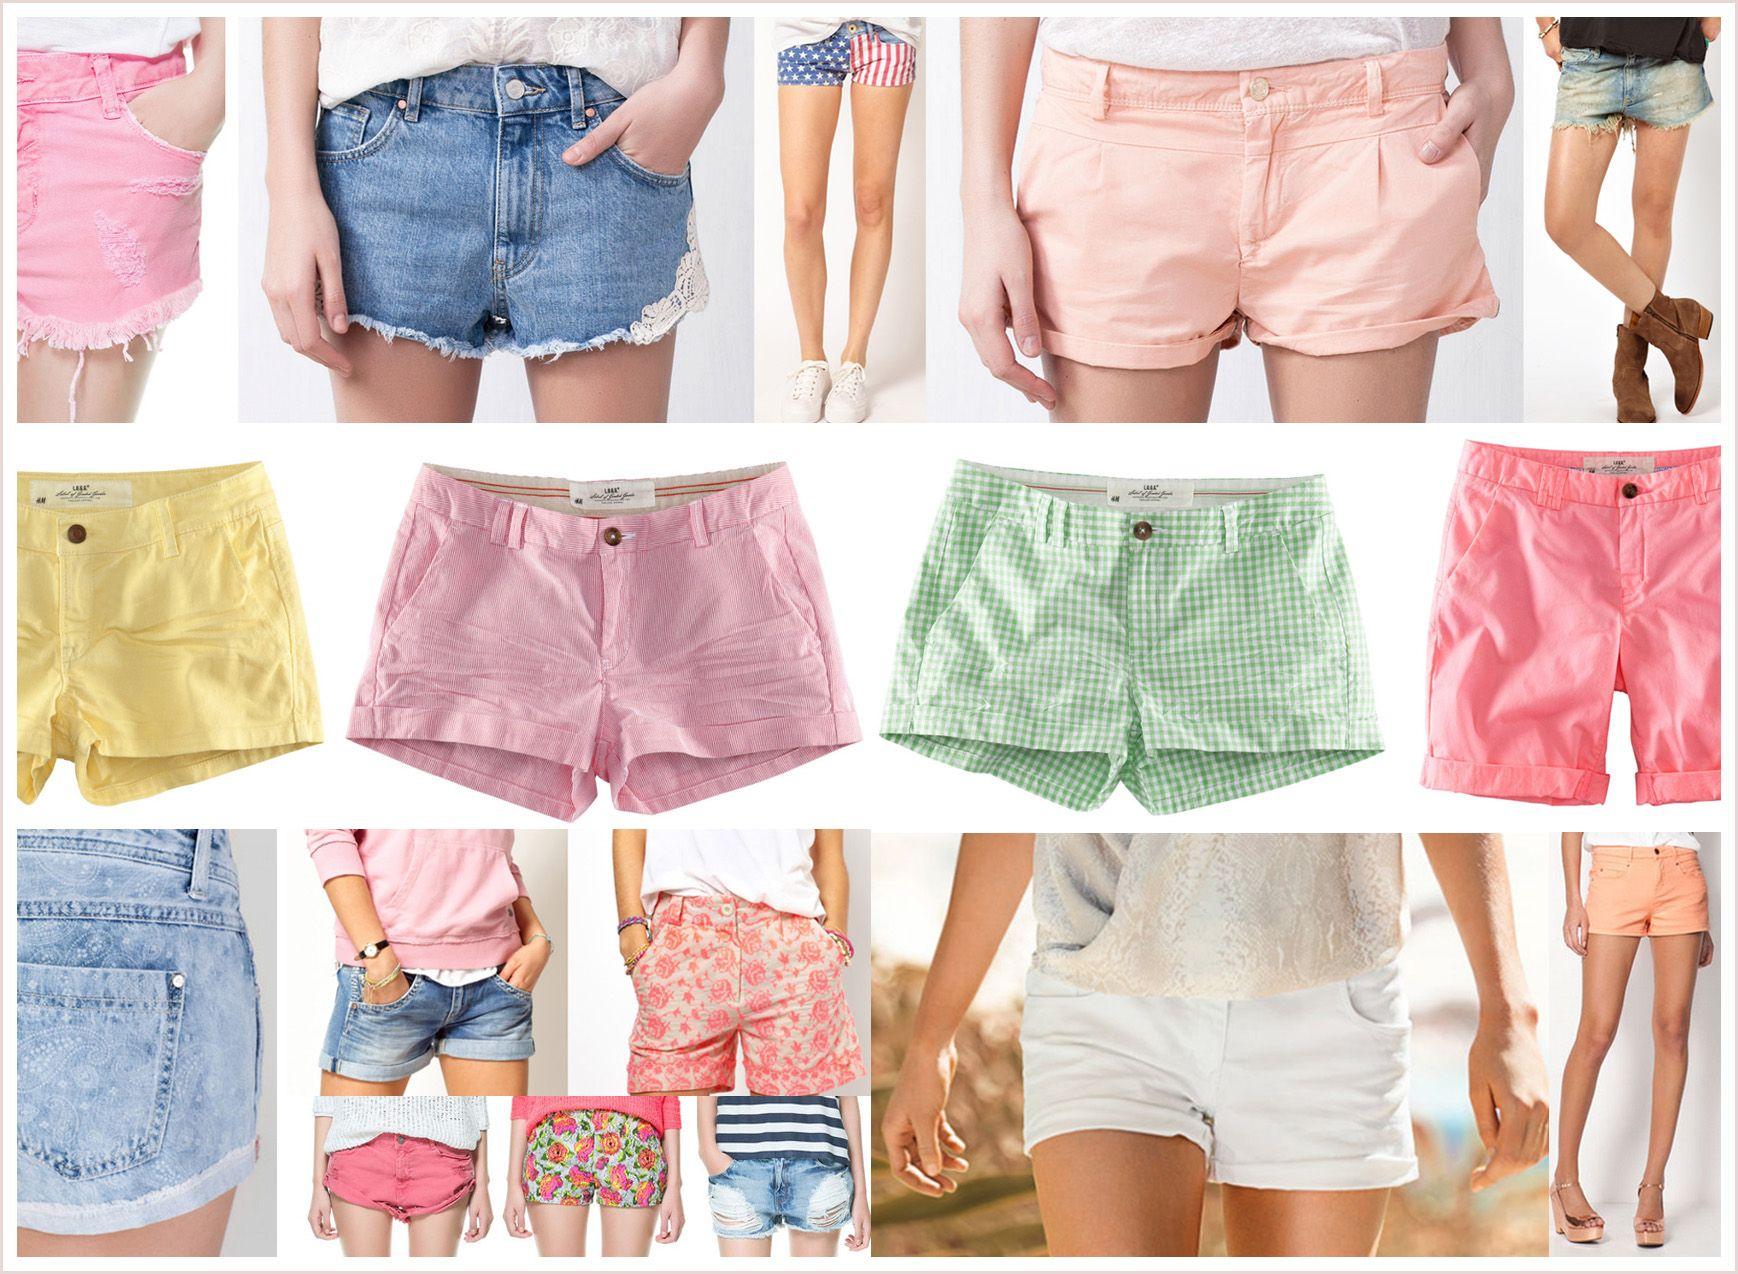 8e4e3fc3f1 Estilo-coreano-2016-verano-moda-para-mujer-floral-denim-shorts-vintage- pantalones-cortos-de-jean-delgada